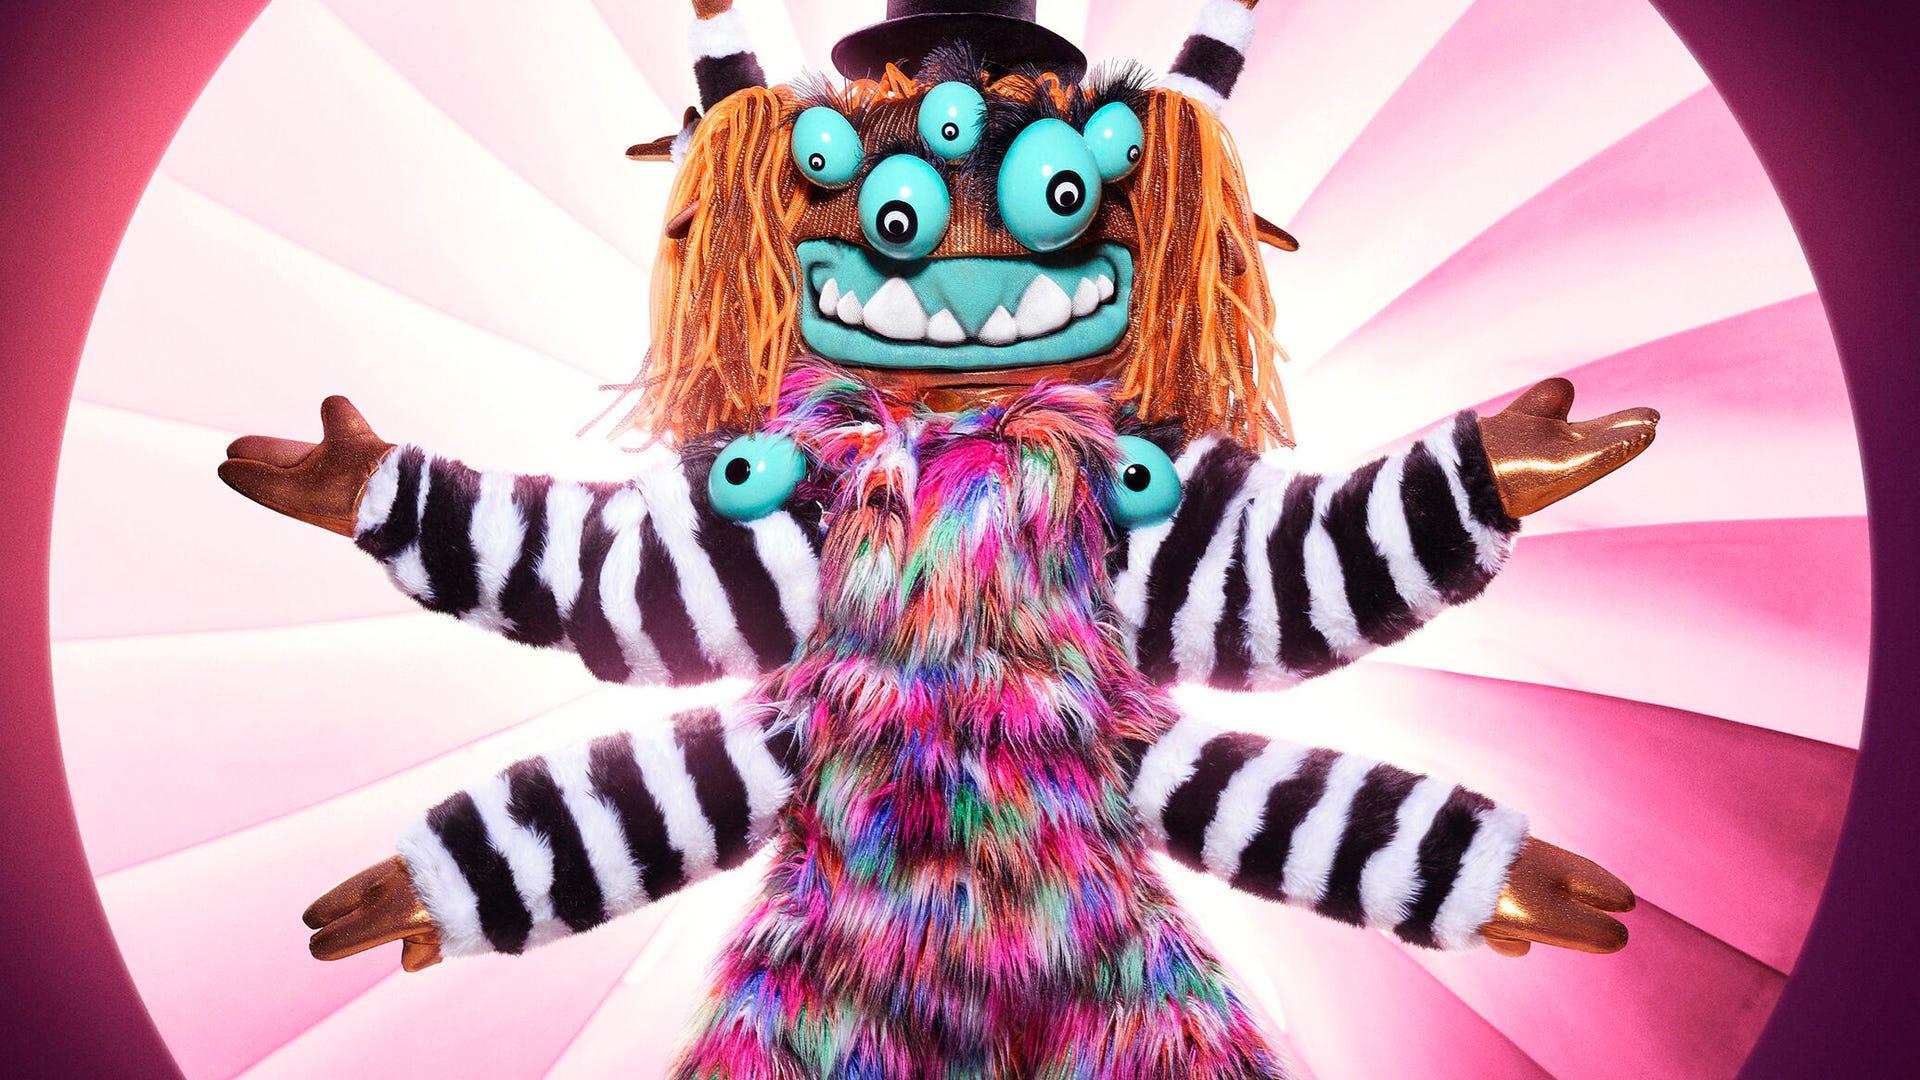 Squigglys, The Masked Singer